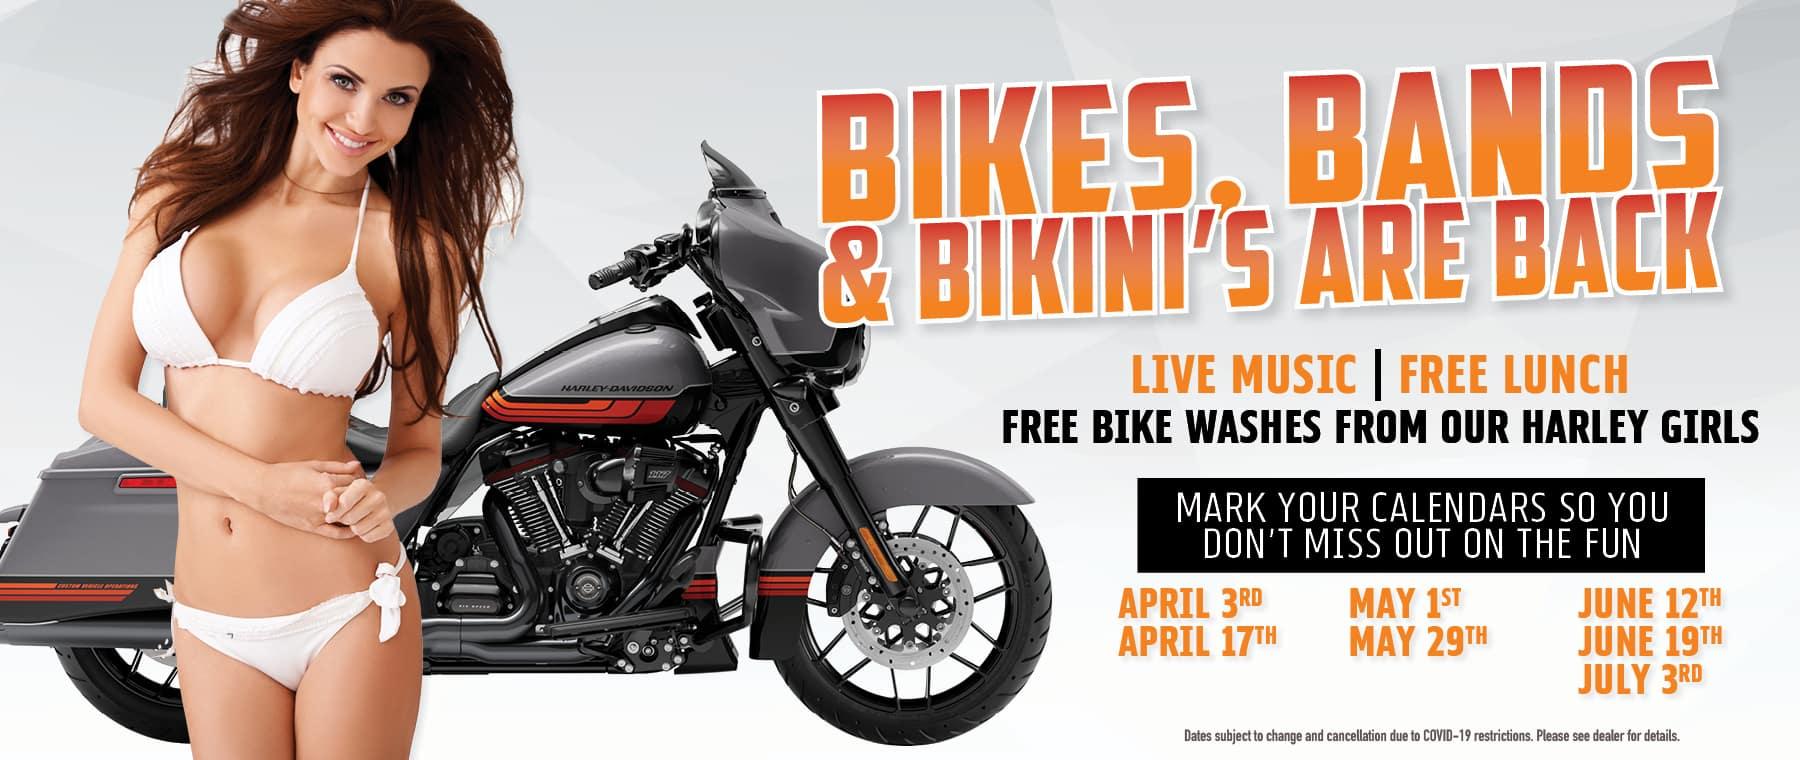 CA01_01_21_Bikes_Bands_Bikinis_R_Back_1800x760_WebBnr